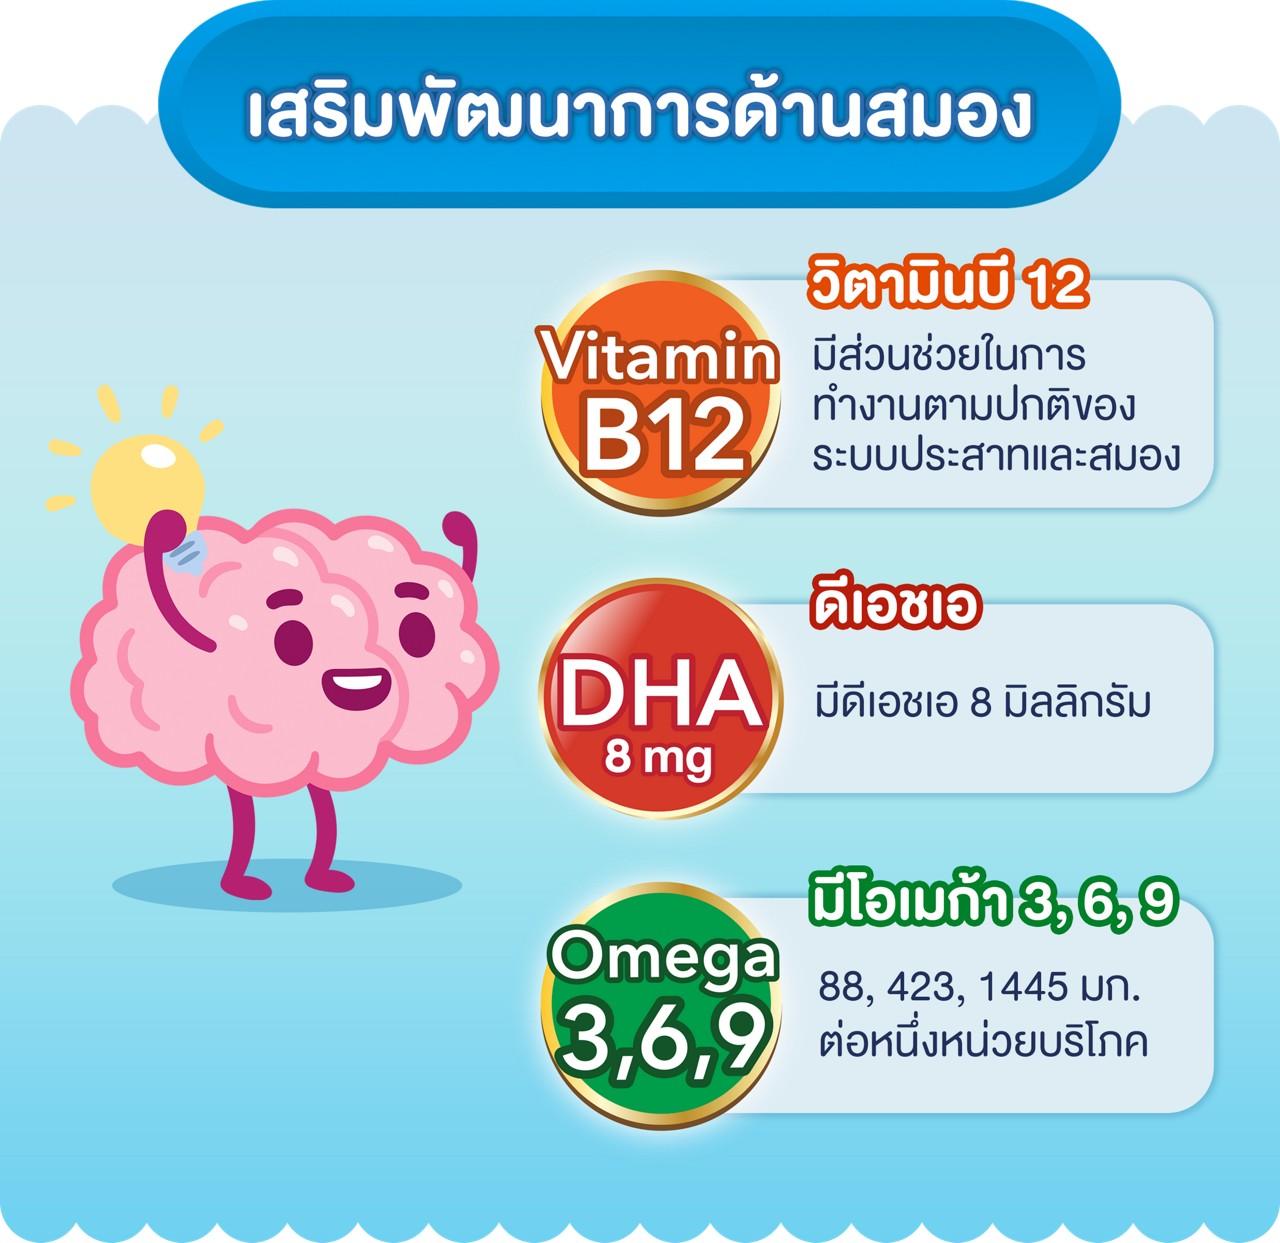 Hi-Q-UHT-stage-3-04-edit-draft3.png